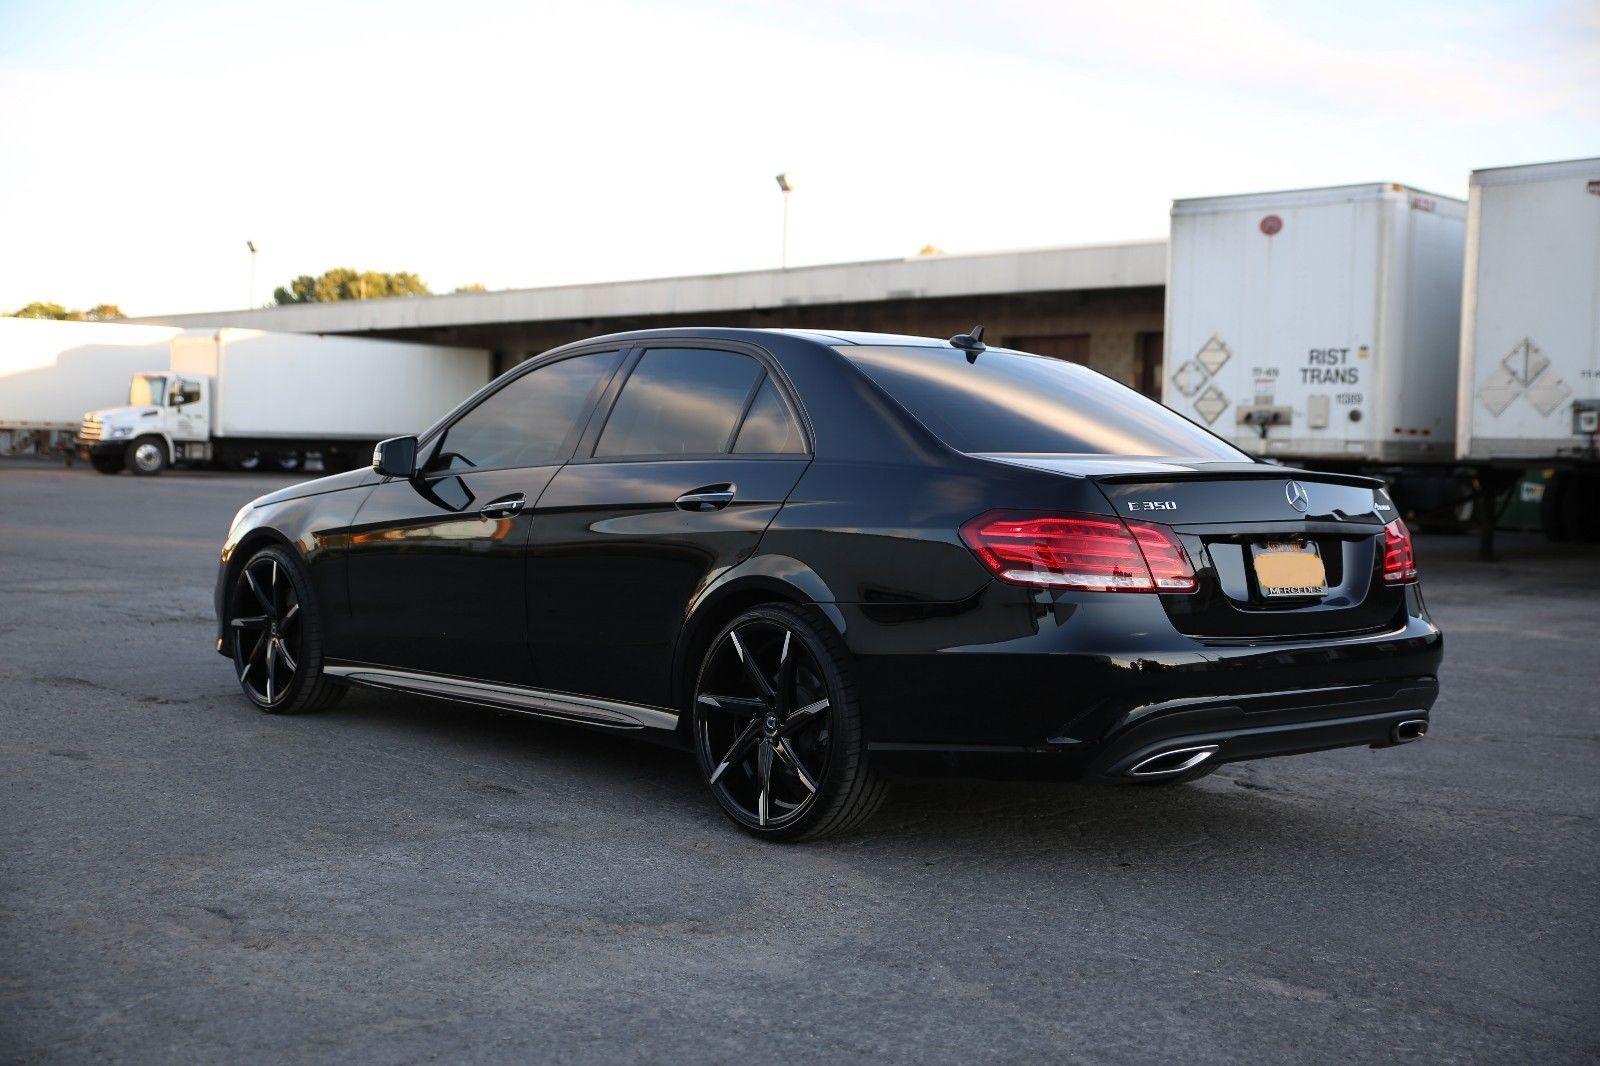 2014 mercedes benz w212 facelift e350 black on black for Mercedes benz black on black